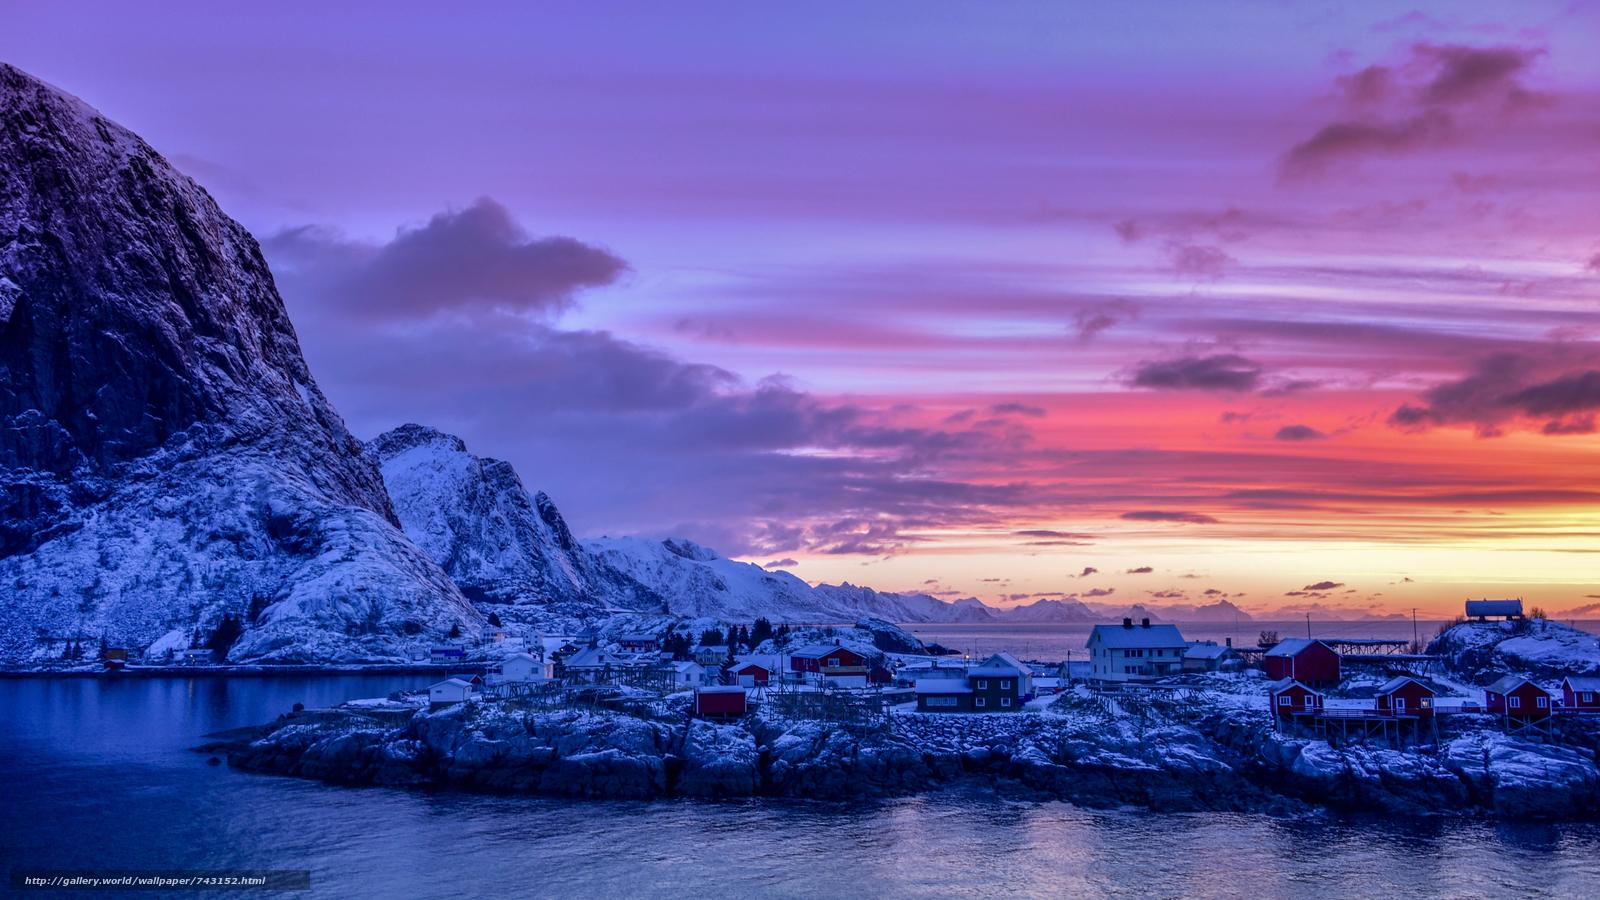 Lofoten, Norway, Lofoten, island, winter, snow, the mountains, rock, houses, water, sky, landscape, nature, view, dusk, night, clouds, Coast, sunset